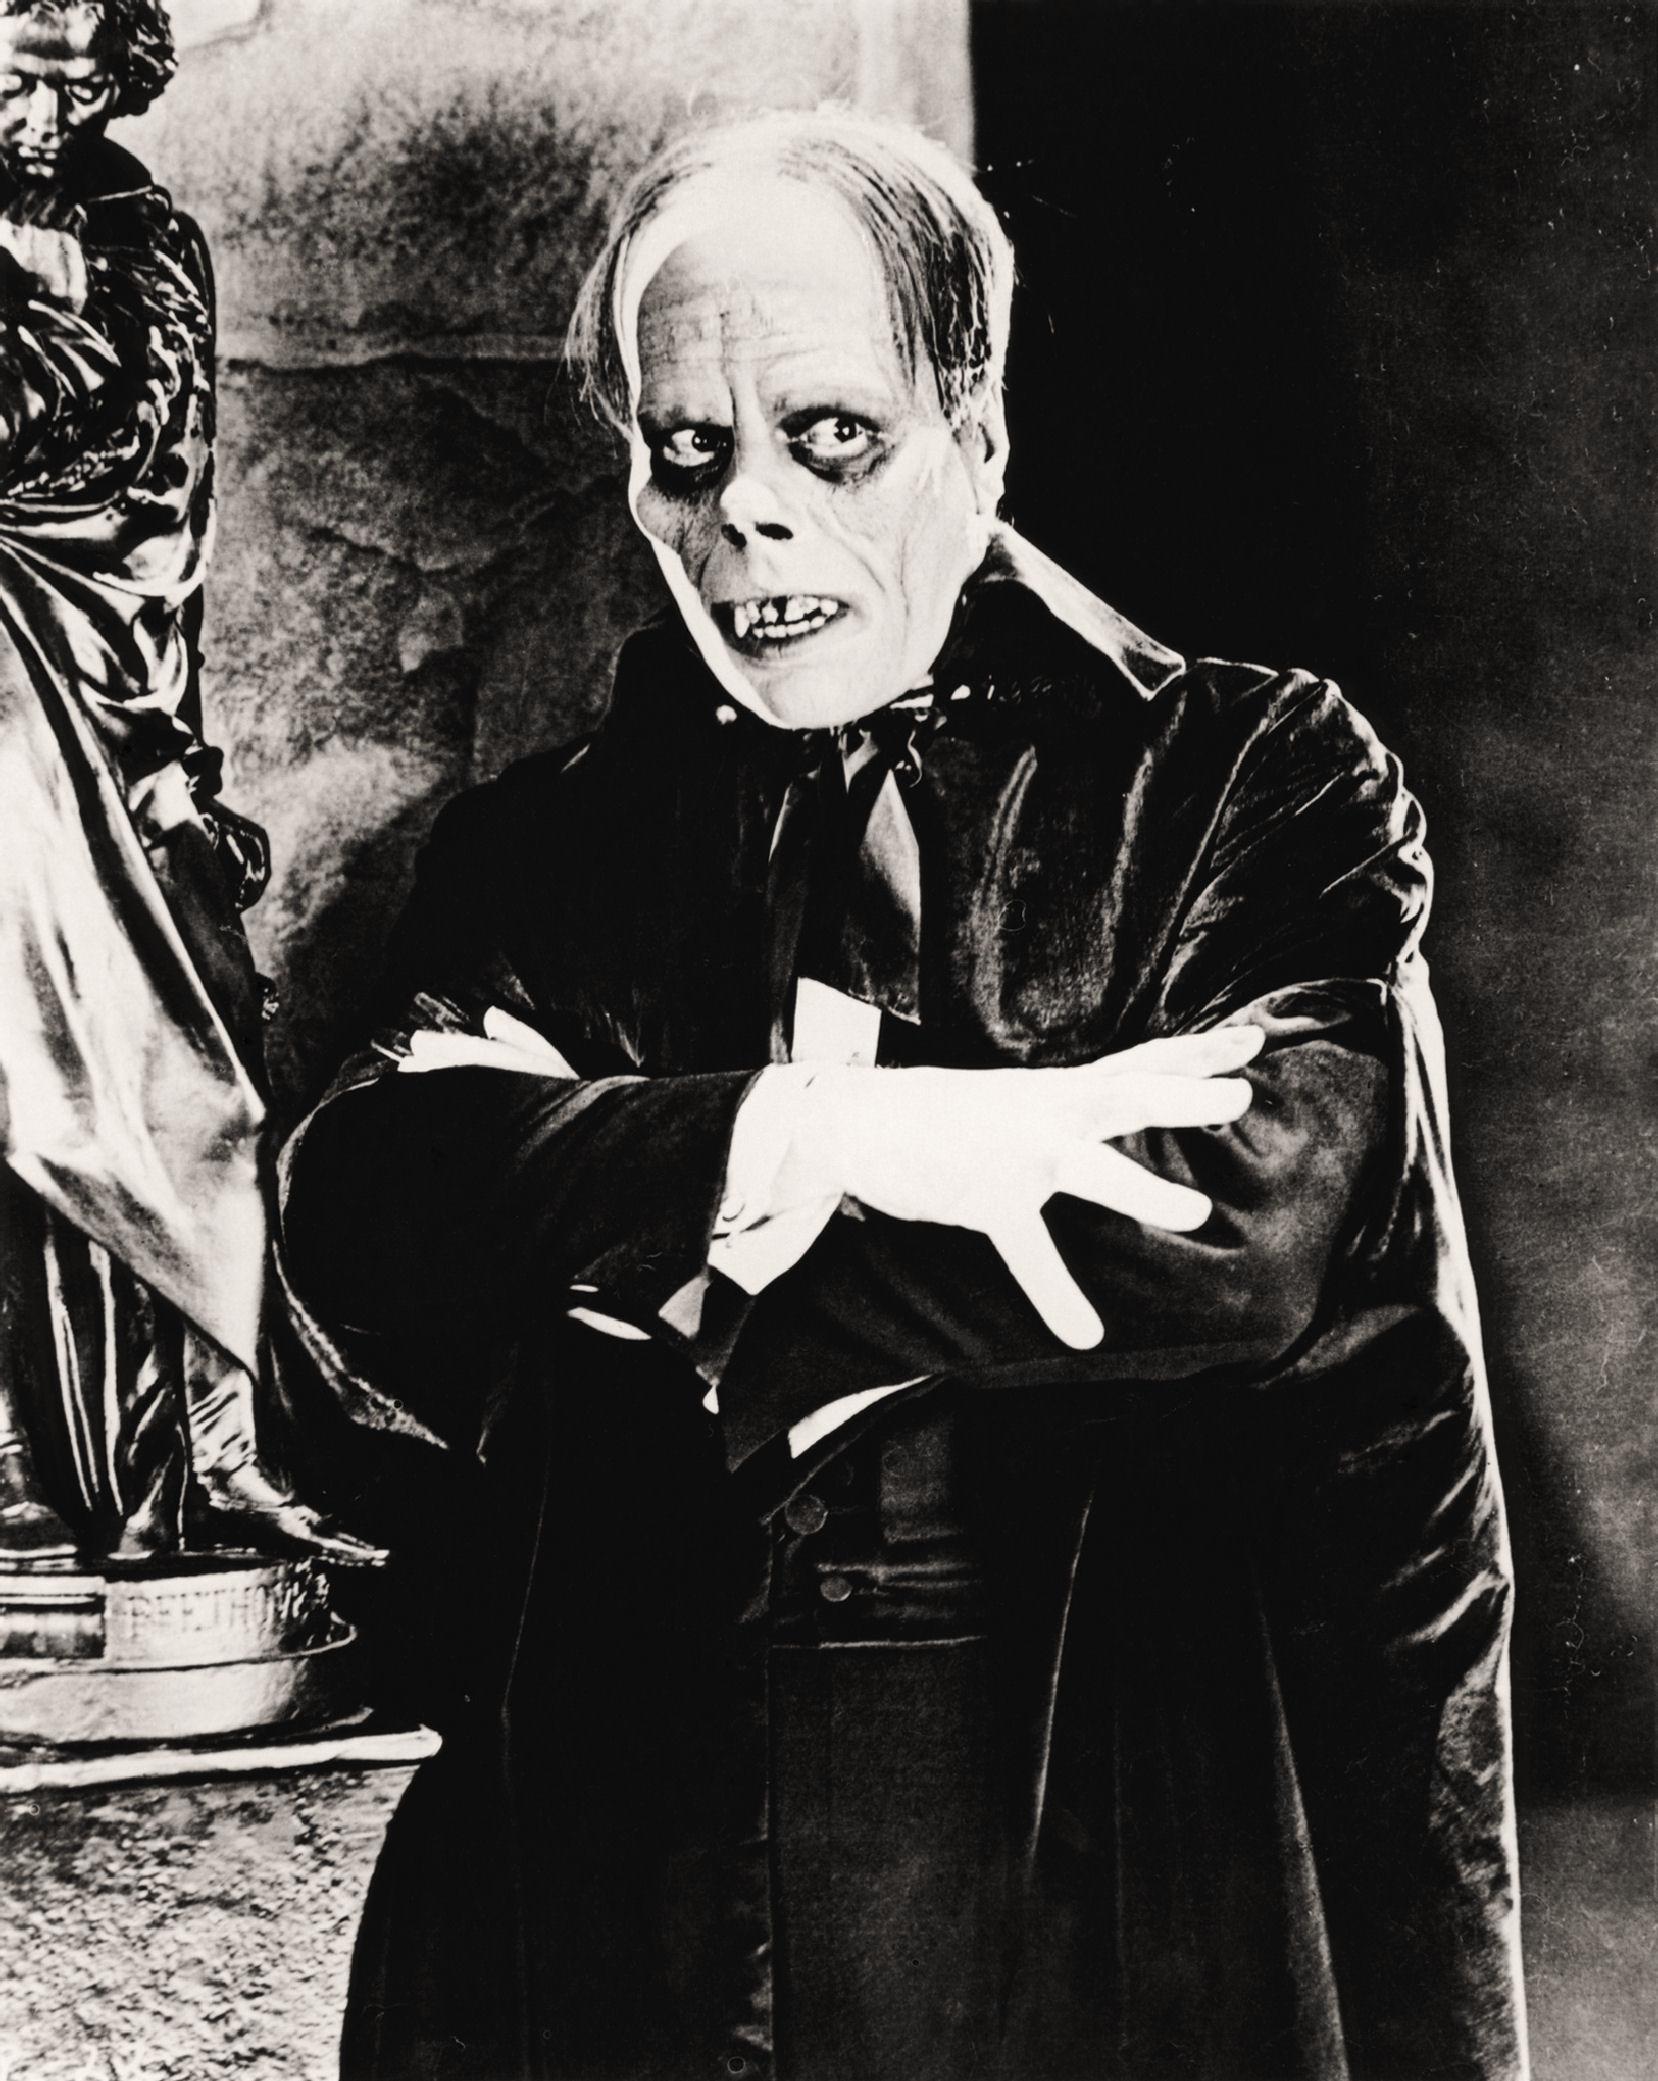 Classic horror movies